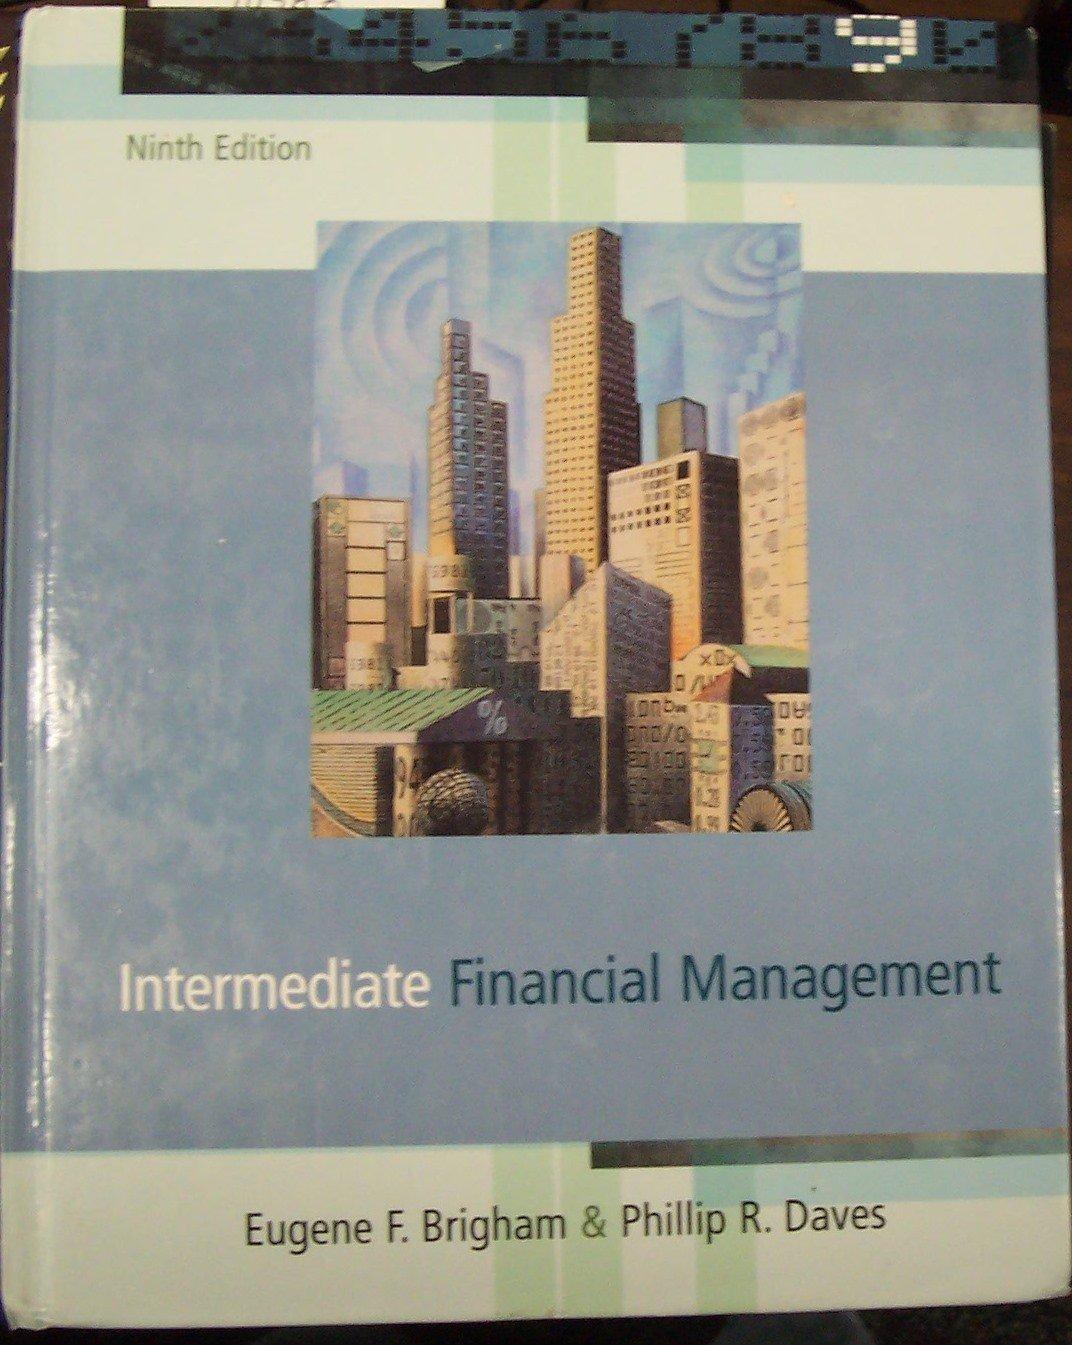 Intermediate Financial Management: Eugene F. Brigham: 9780324319873:  Amazon.com: Books